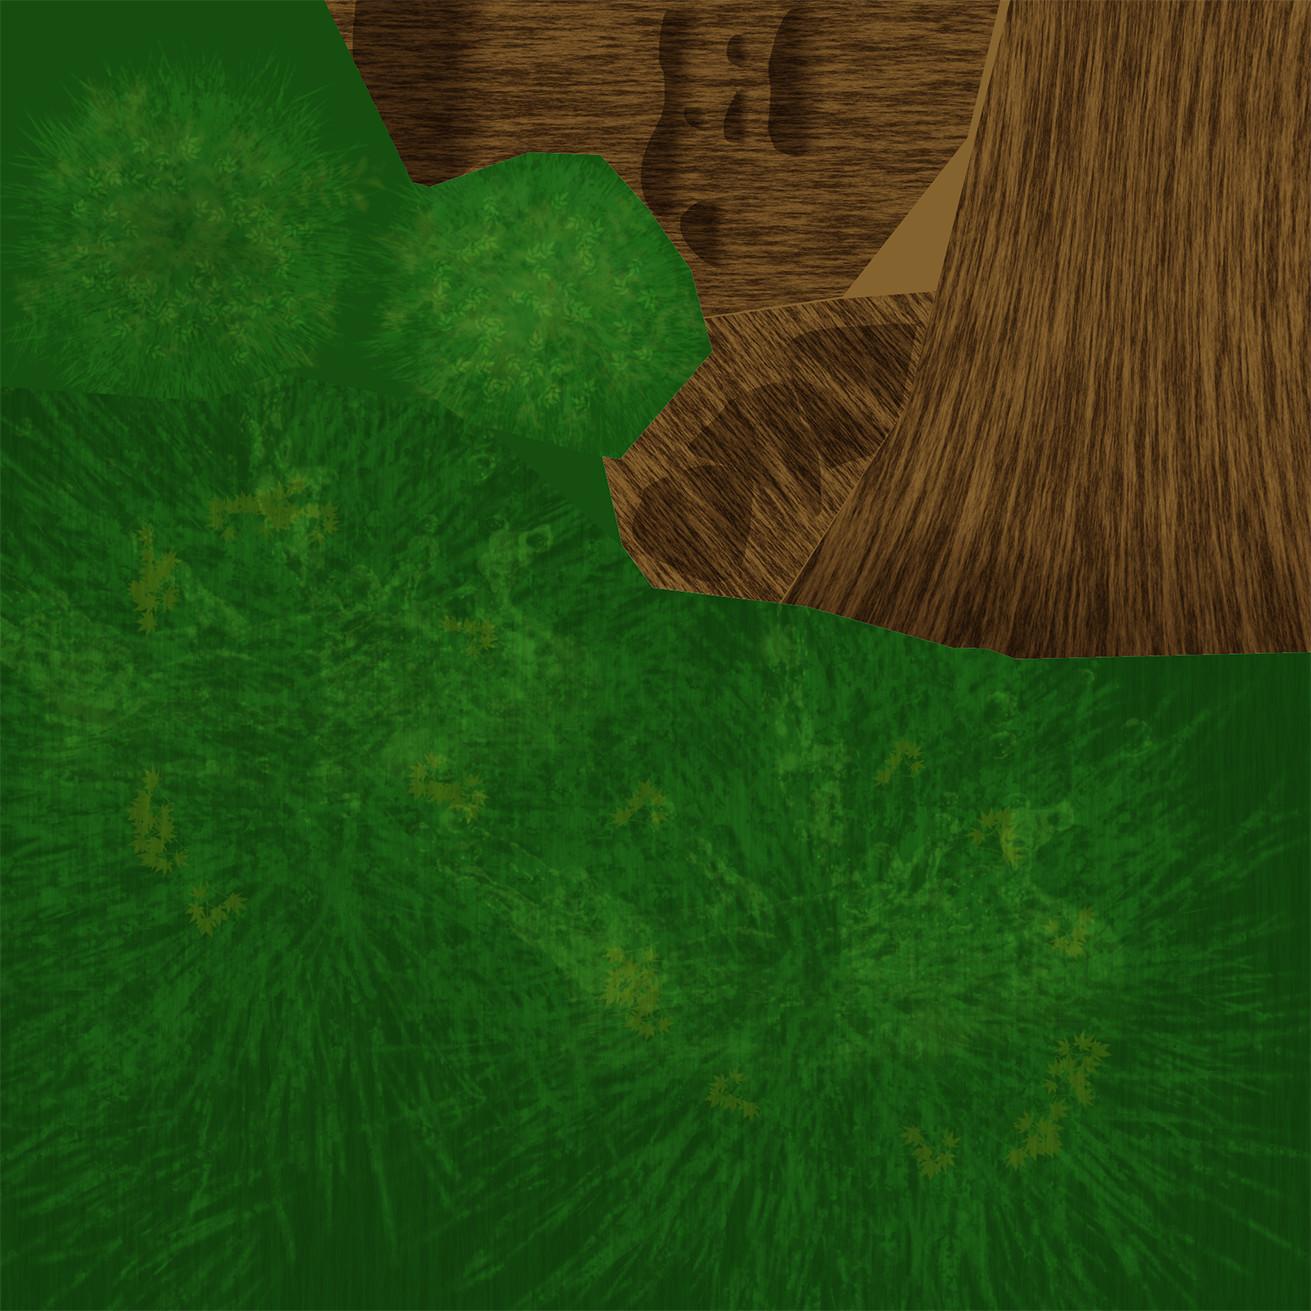 Tree and Bush texture